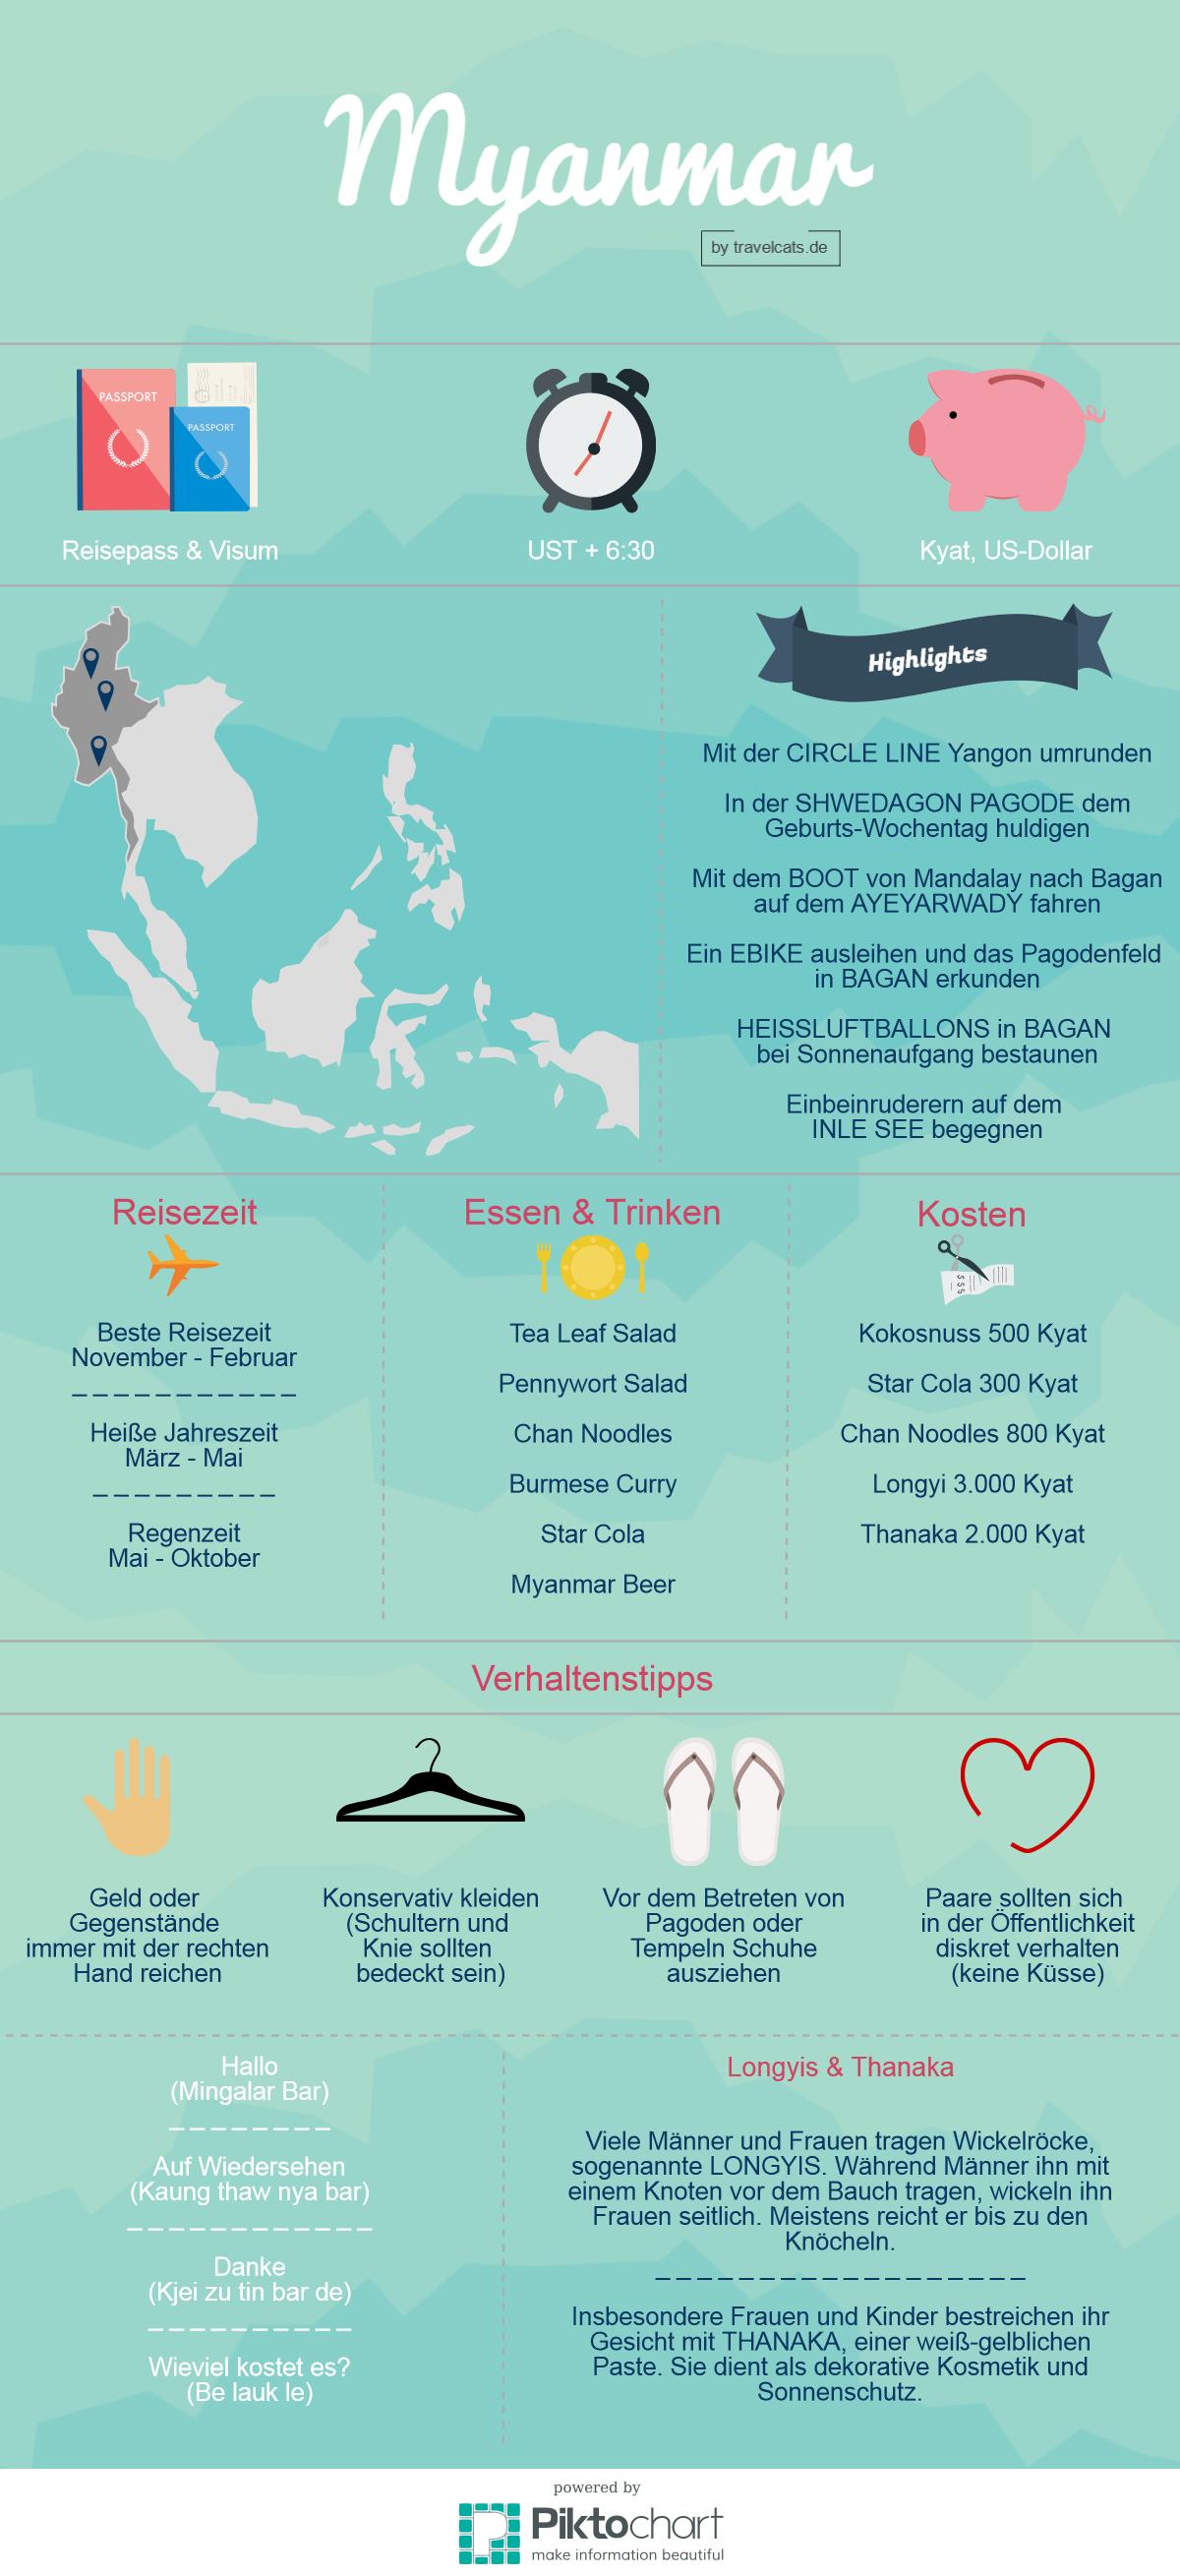 , Rundreise Myanmar: Fazit | Gedanken, Inspiration, Bilder, travelcats, My Travels Blog 2020, My Travels Blog 2020